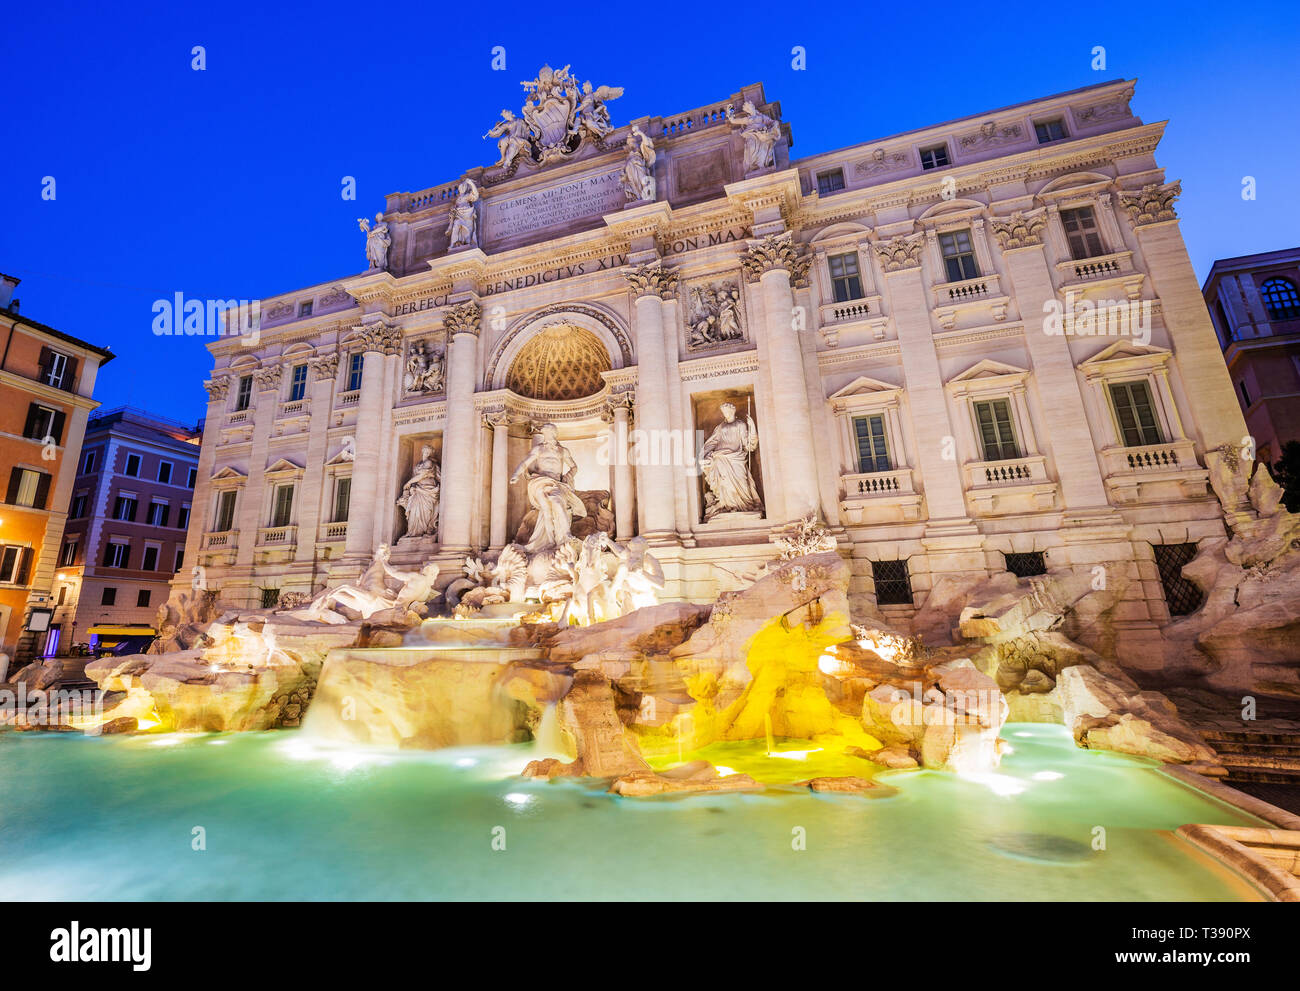 Rome, Italy. Trevi Fountain (Fontana di Trevi) most famous fountain of Rome. Stock Photo